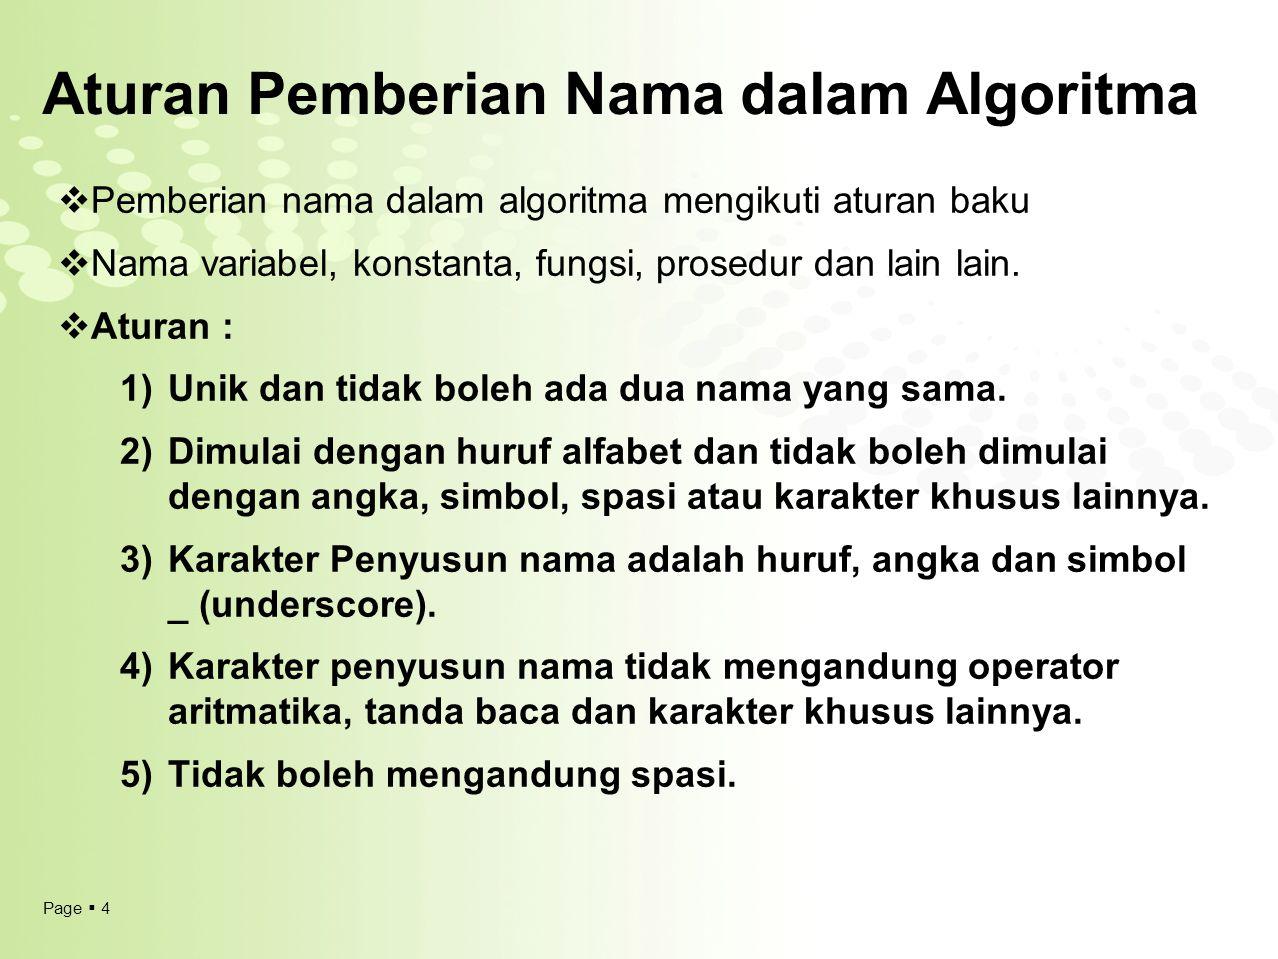 Page  4 Aturan Pemberian Nama dalam Algoritma  Pemberian nama dalam algoritma mengikuti aturan baku  Nama variabel, konstanta, fungsi, prosedur dan